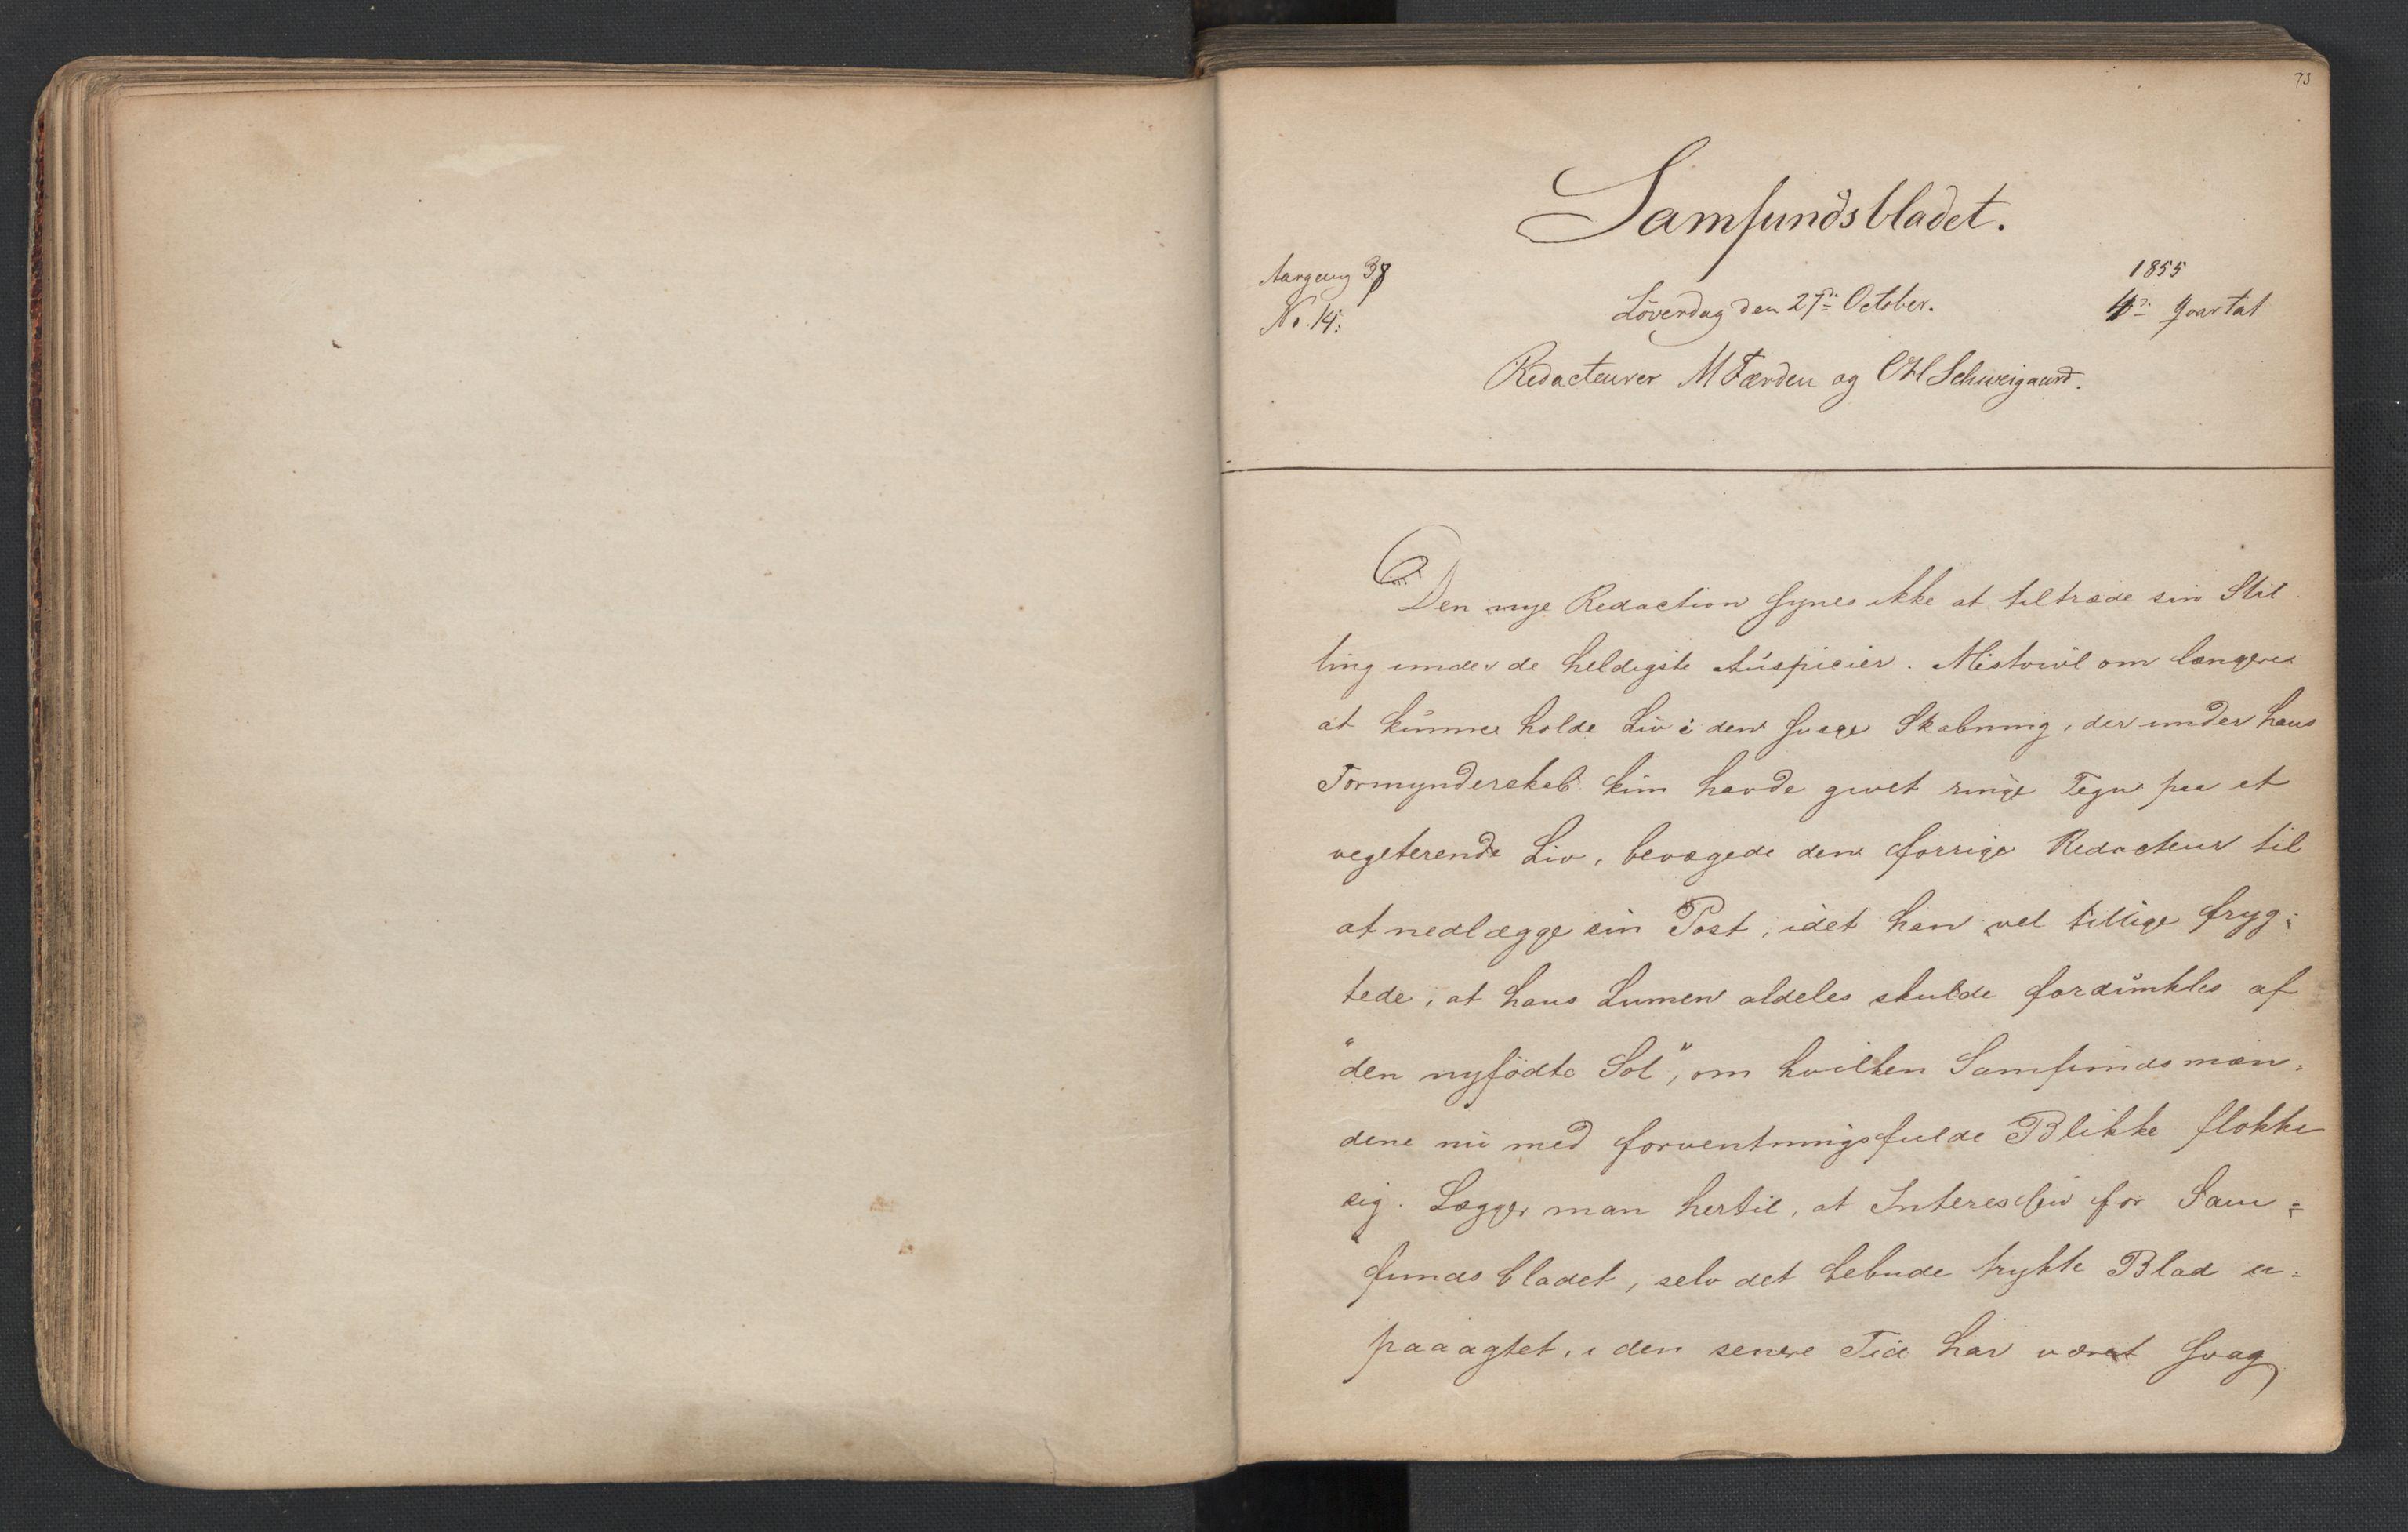 RA, Det Norske Studentersamfund, X/Xa/L0005, 1855-1856, s. 38